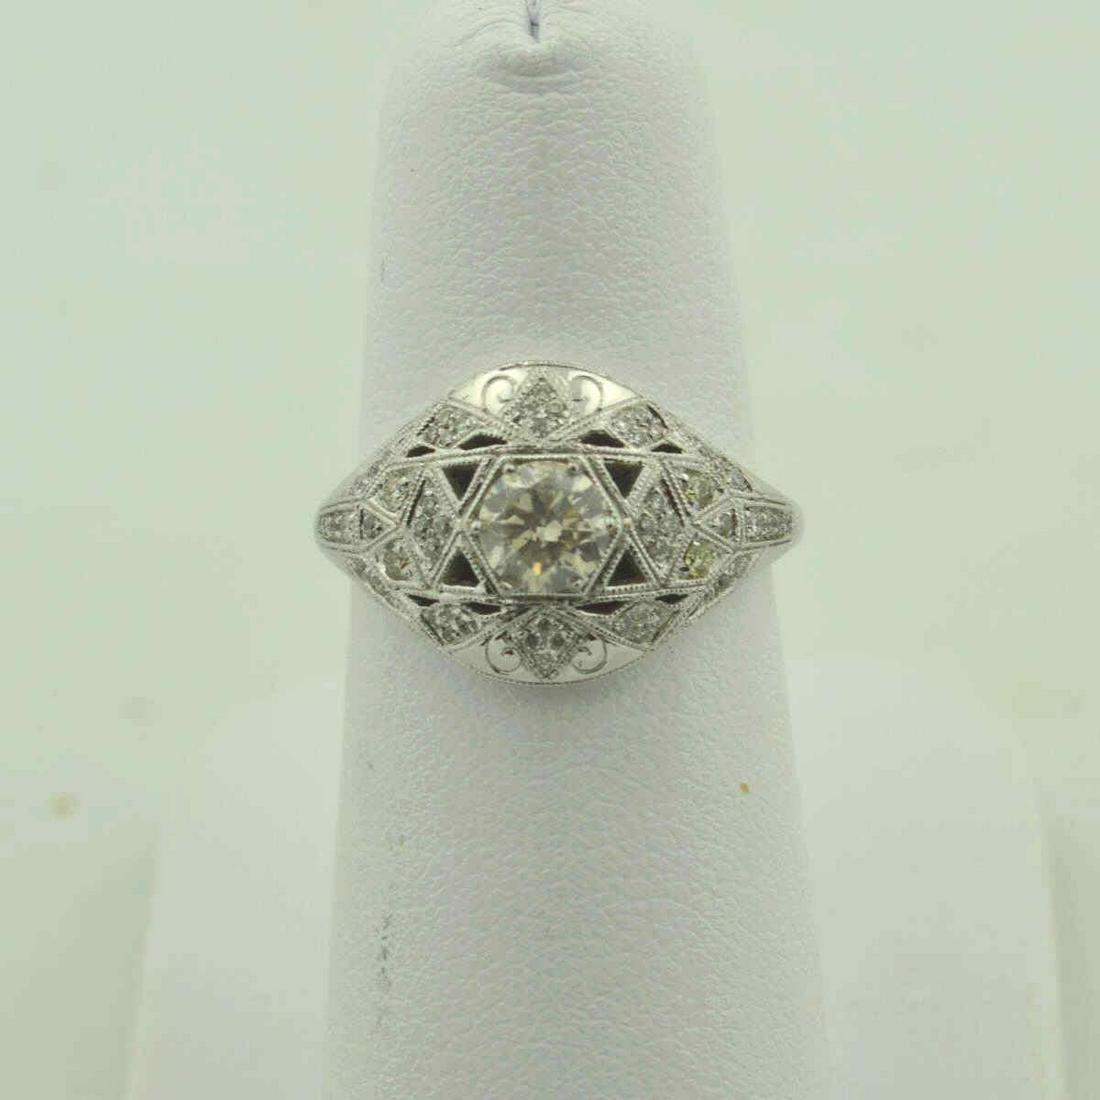 18kt white gold Art Deco style diamond ring